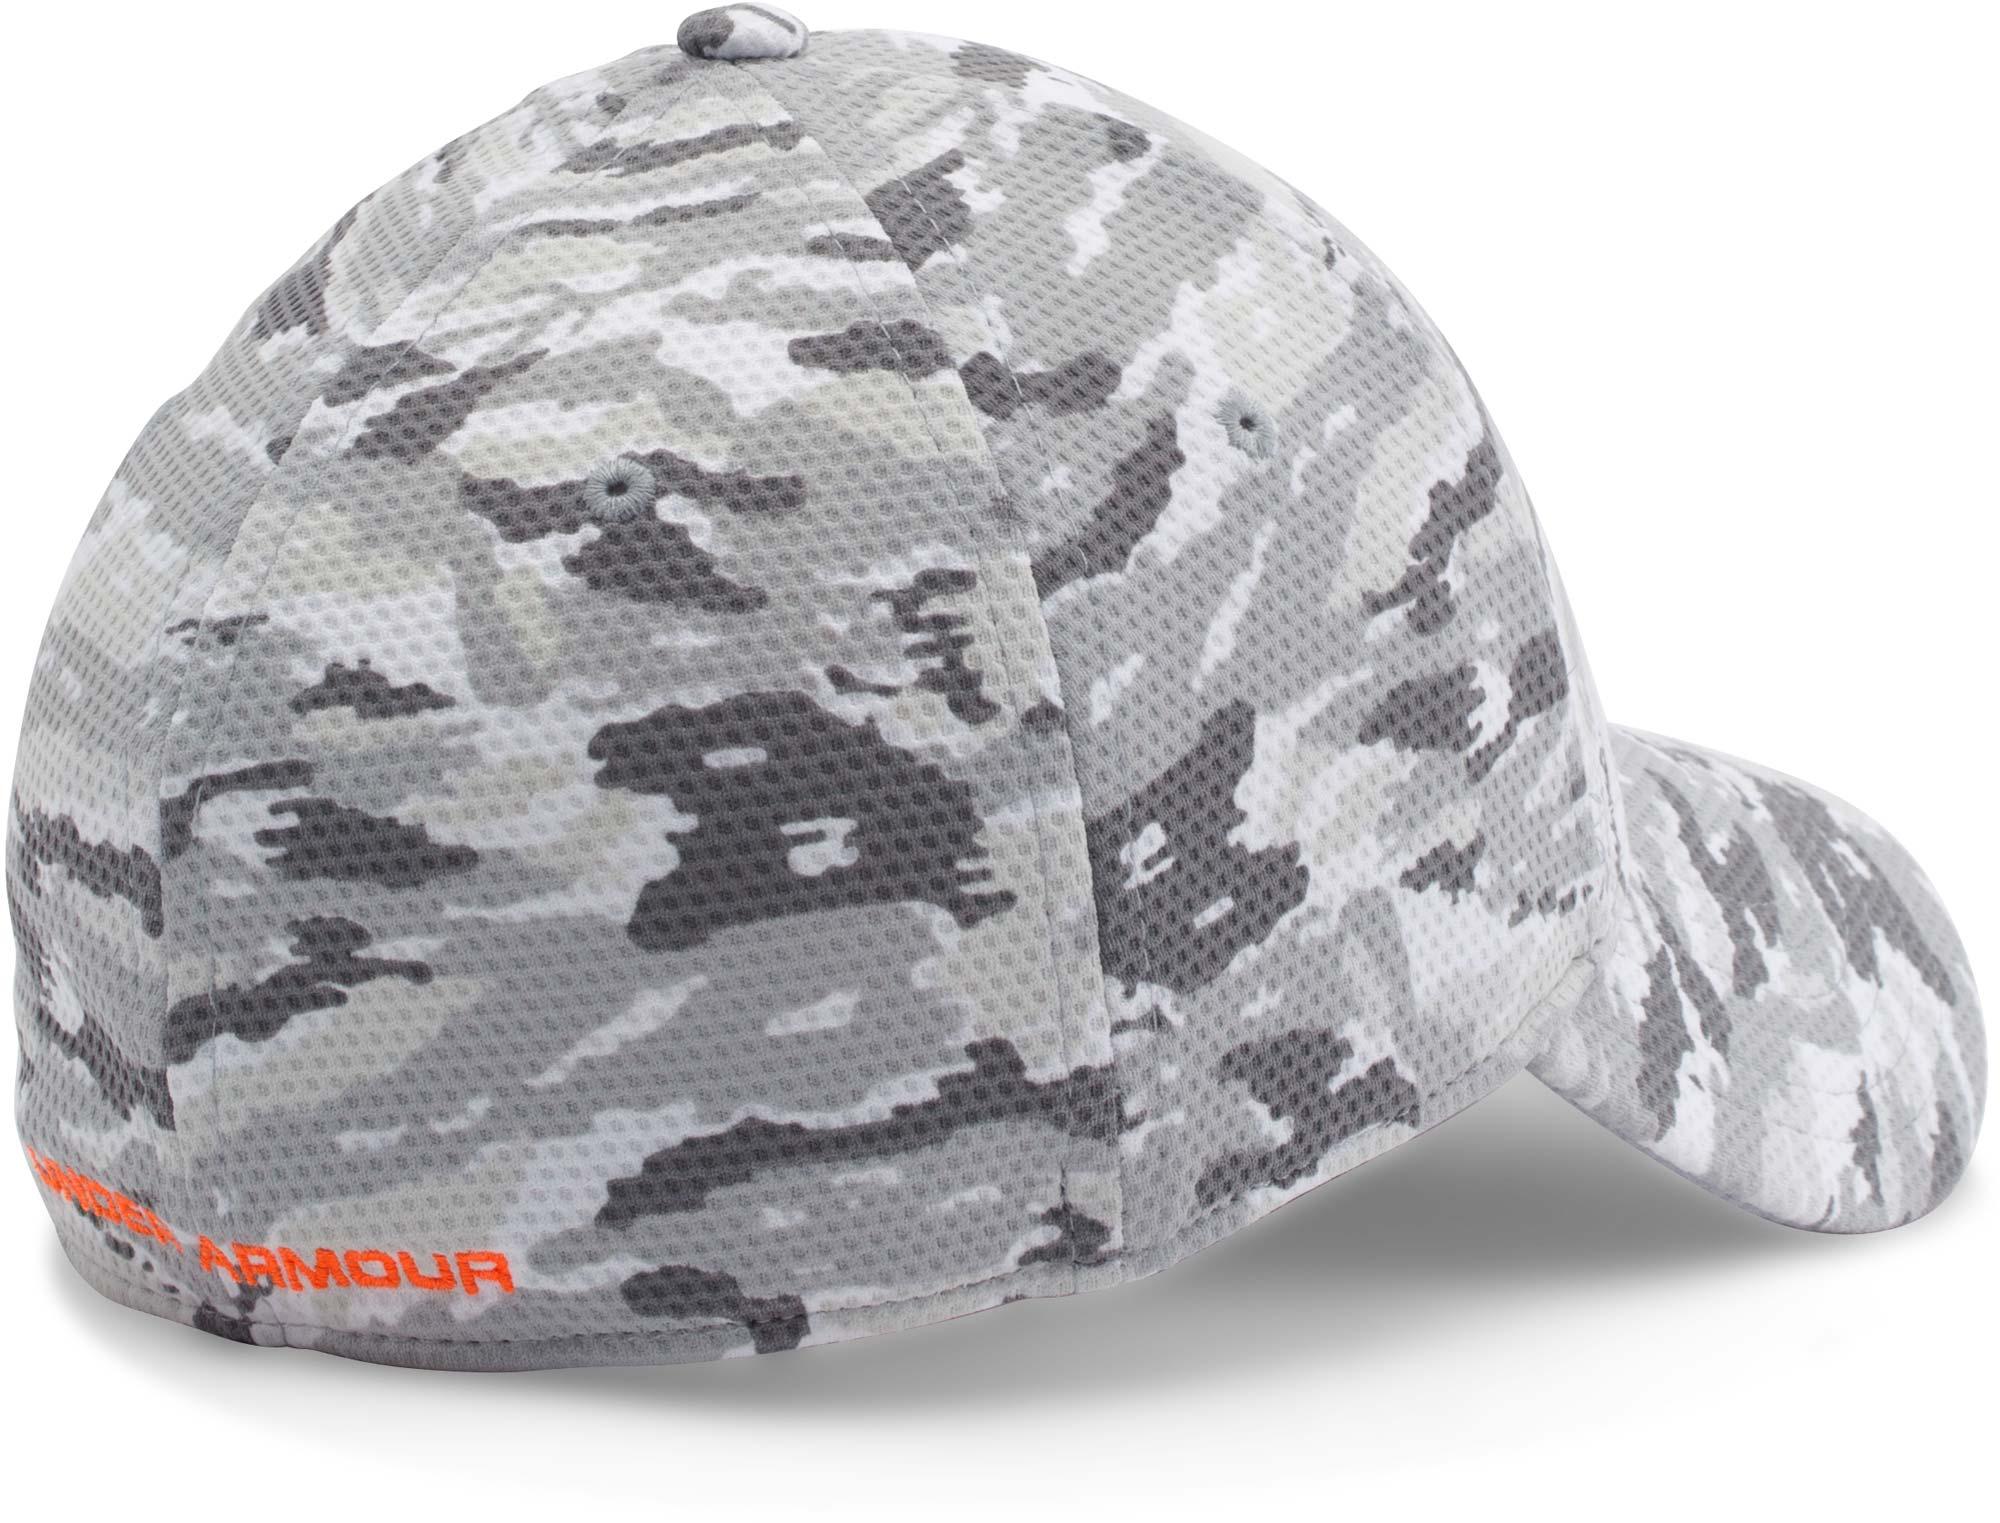 Under Armour MEN´S PRINT BLITZING CAP | sportisimopro cz